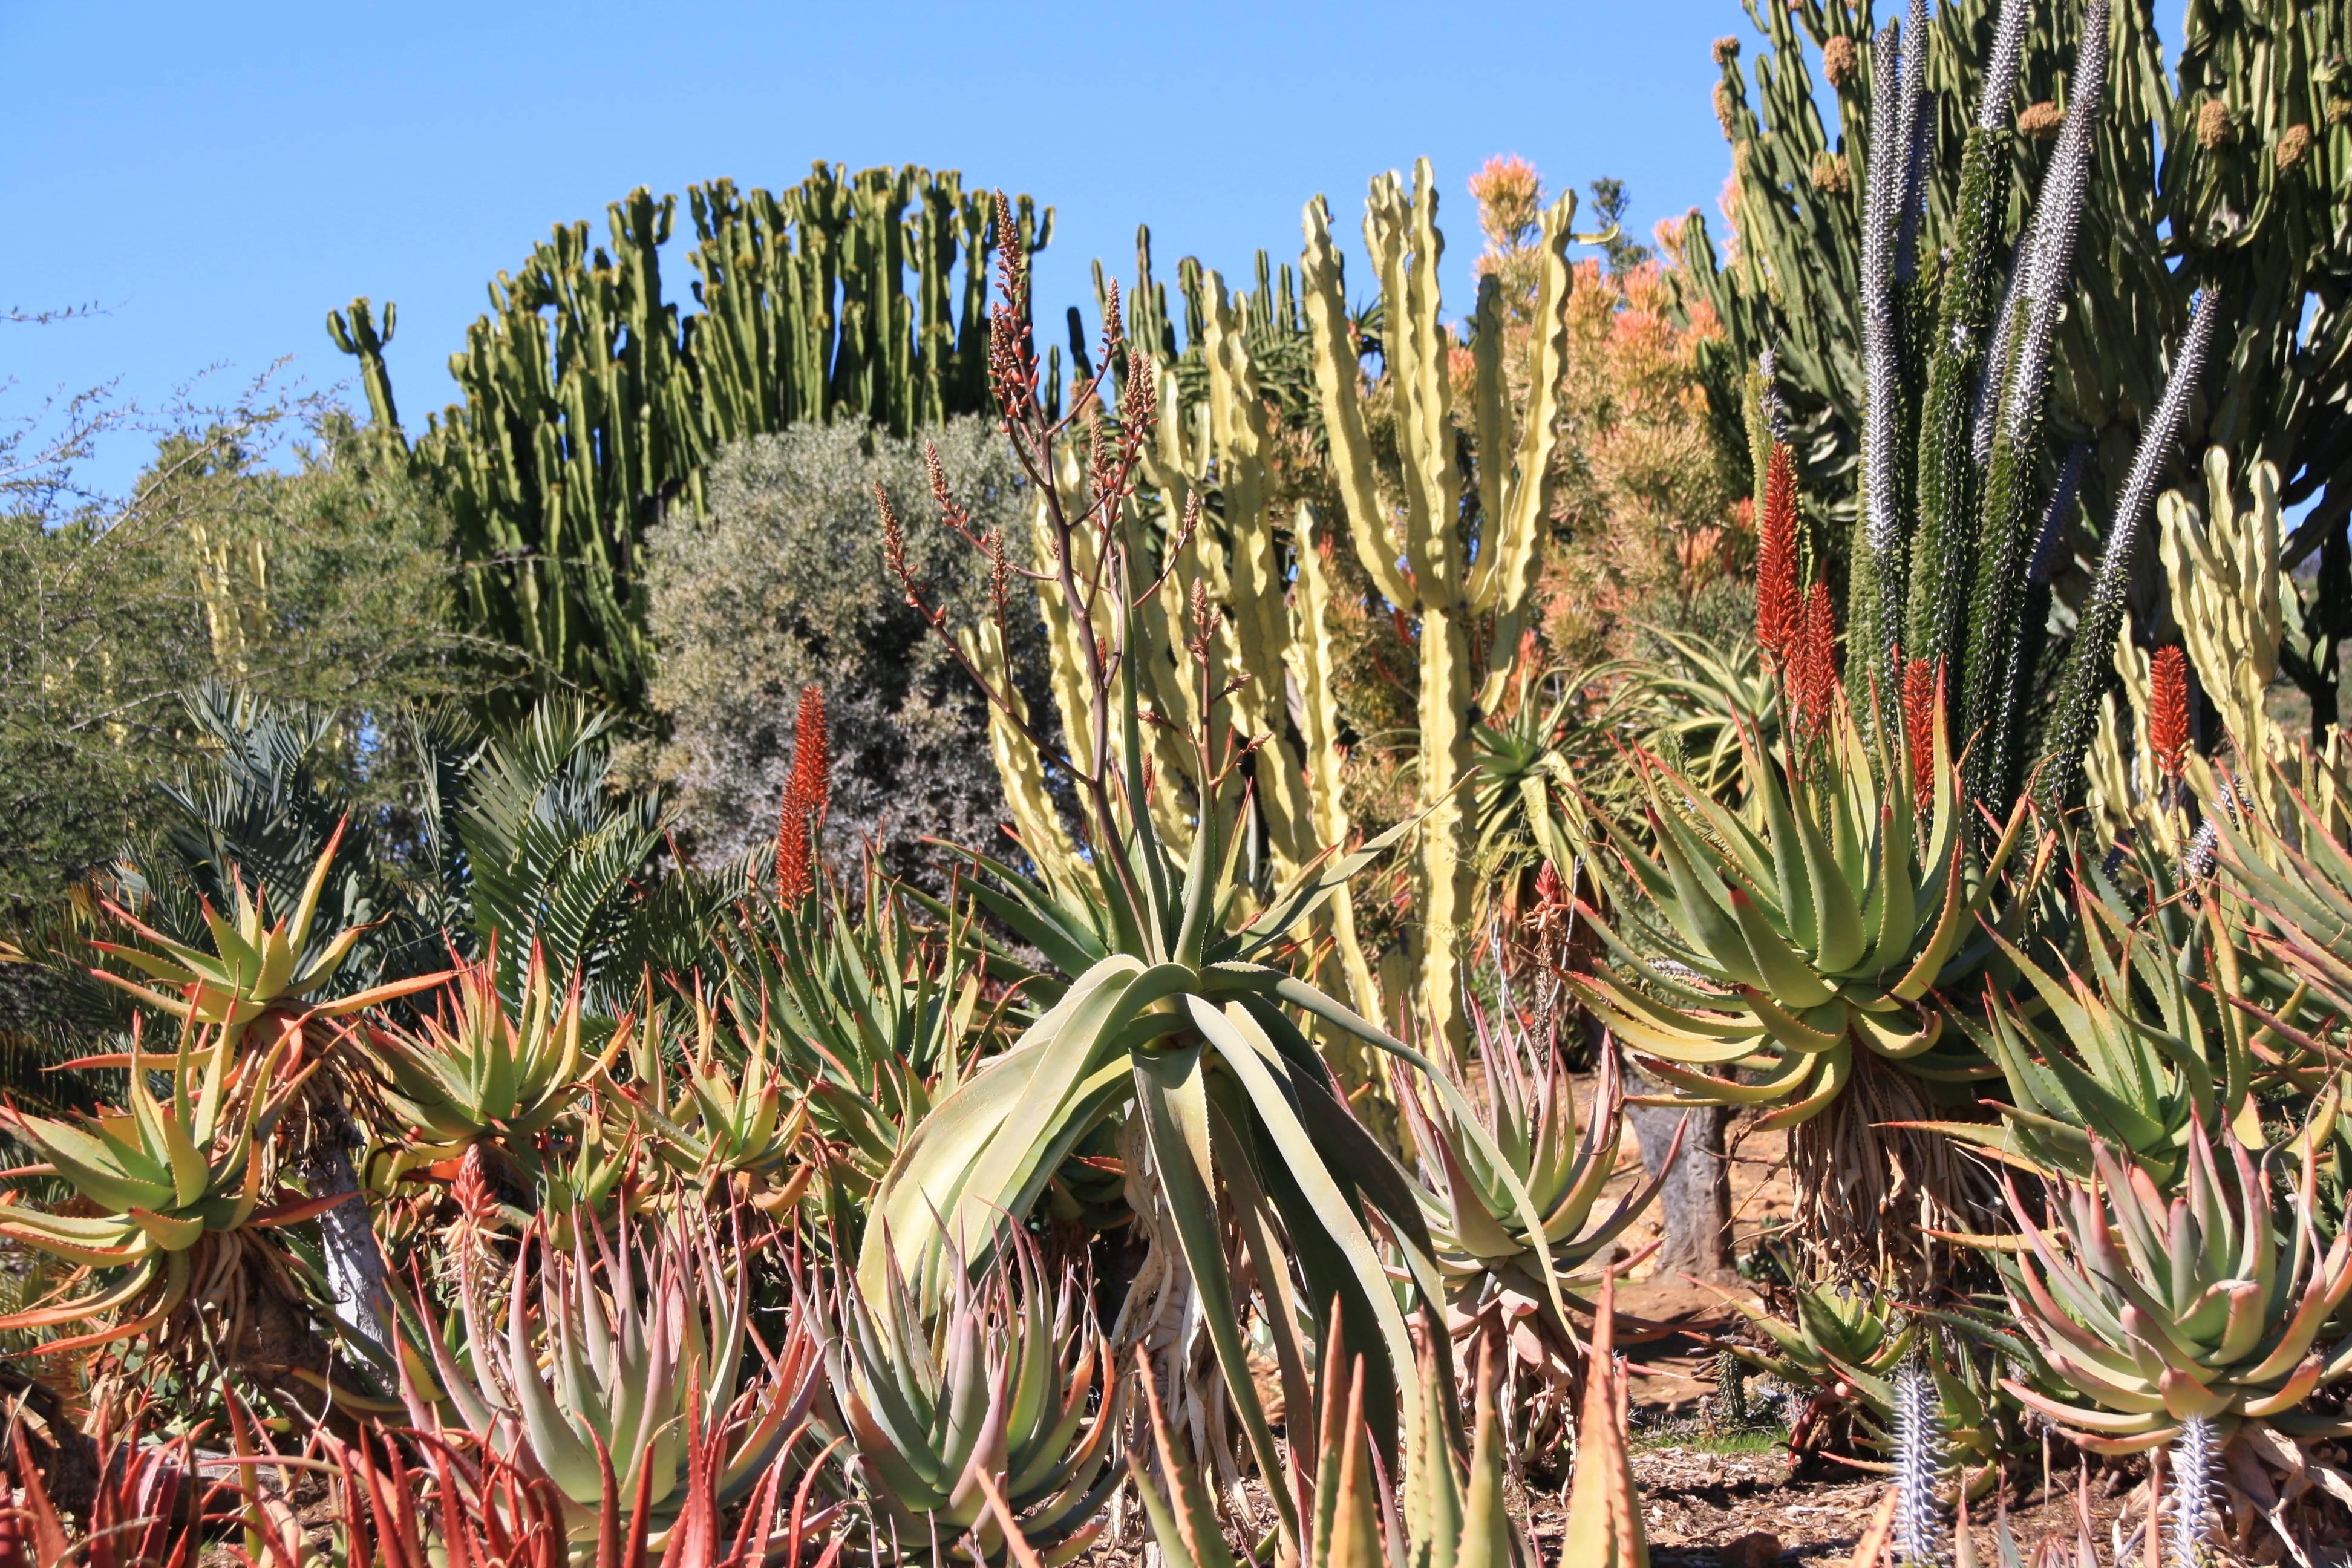 Cactus garden at San Diego Safari Park in Escondido CA